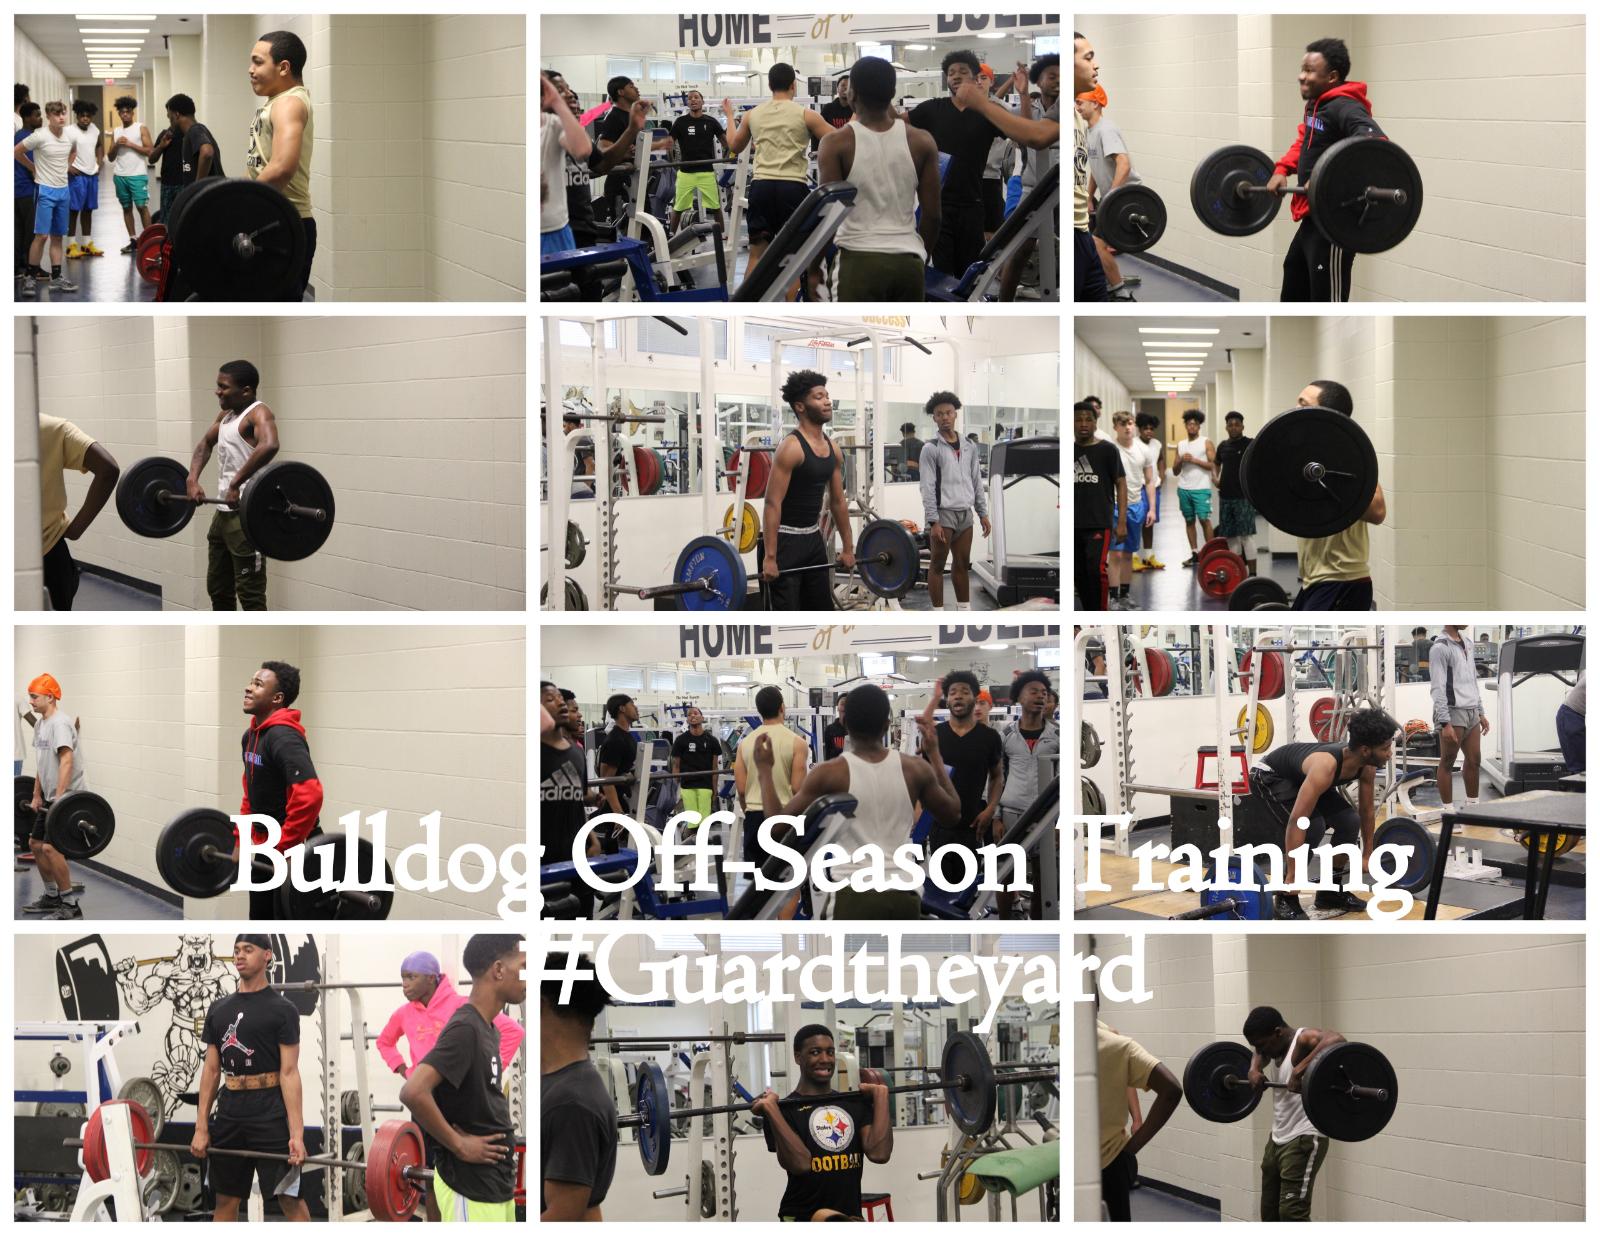 Bulldog Football — Weight Training